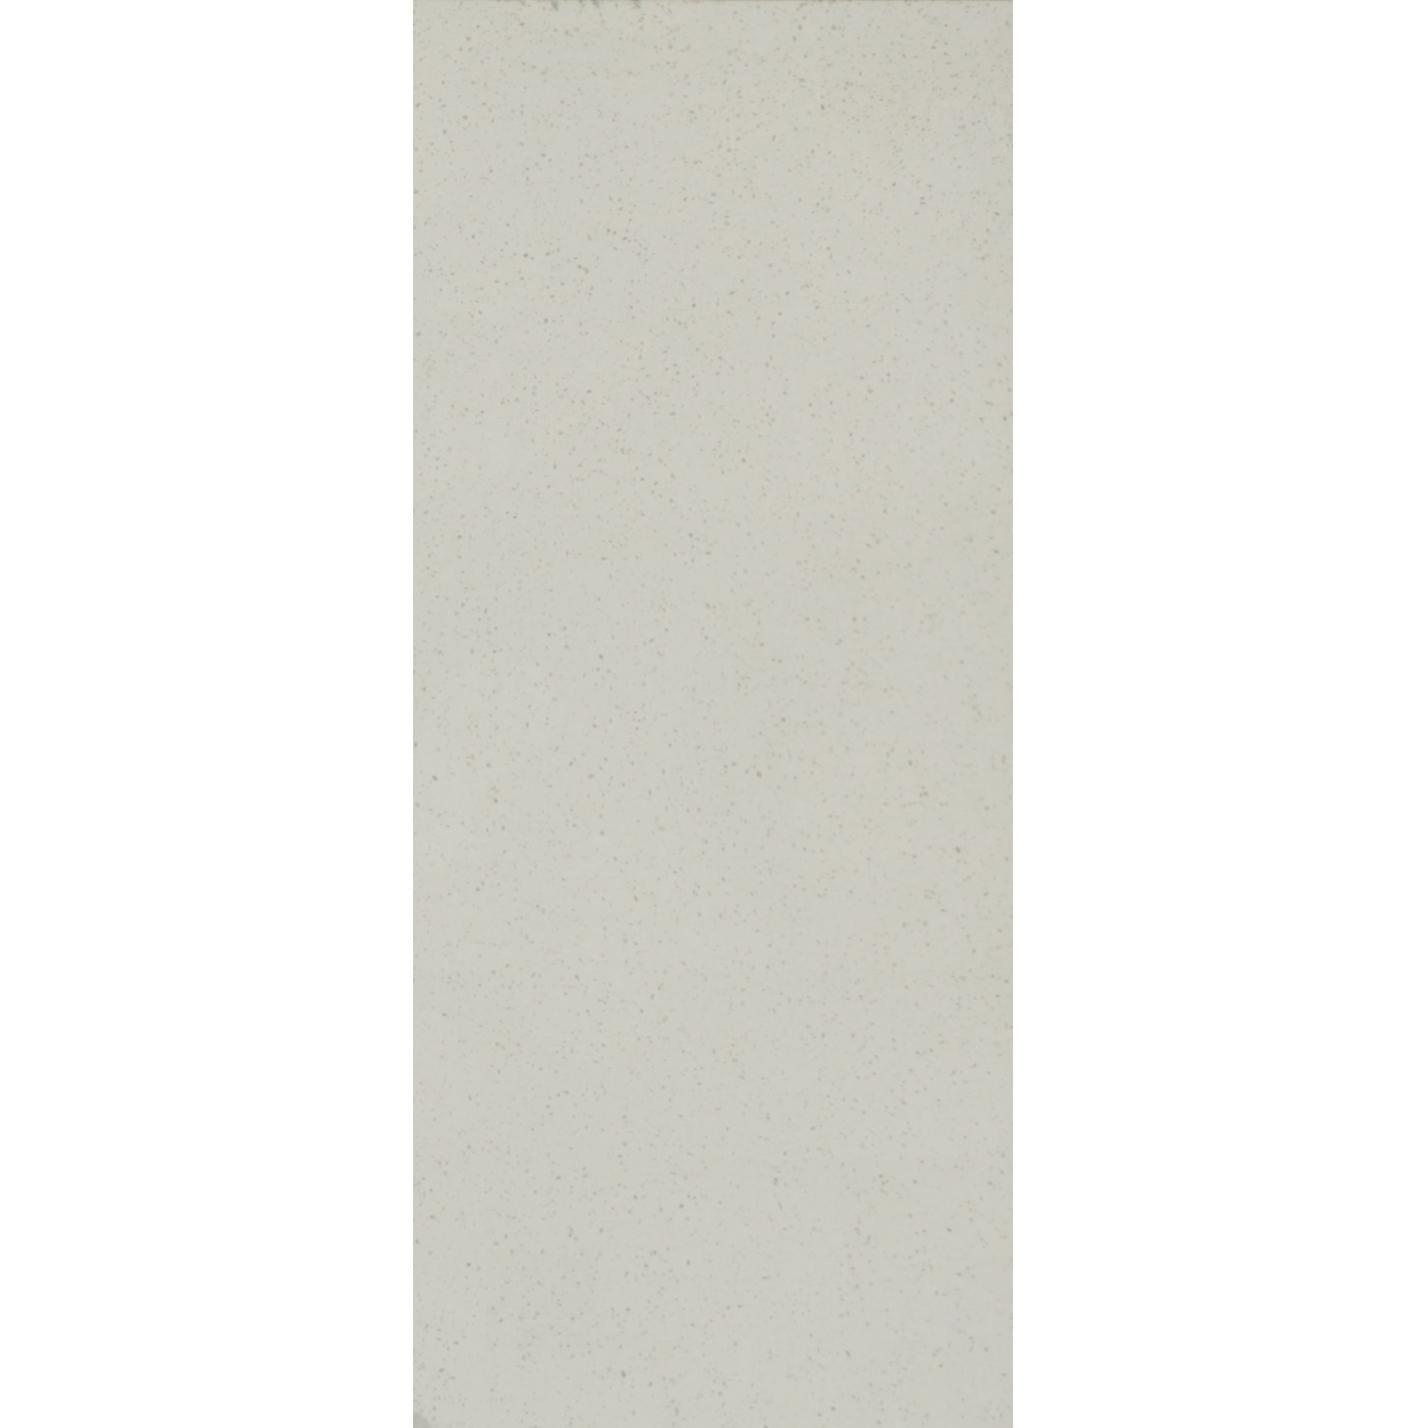 Image for Q 27071-1: Iced White